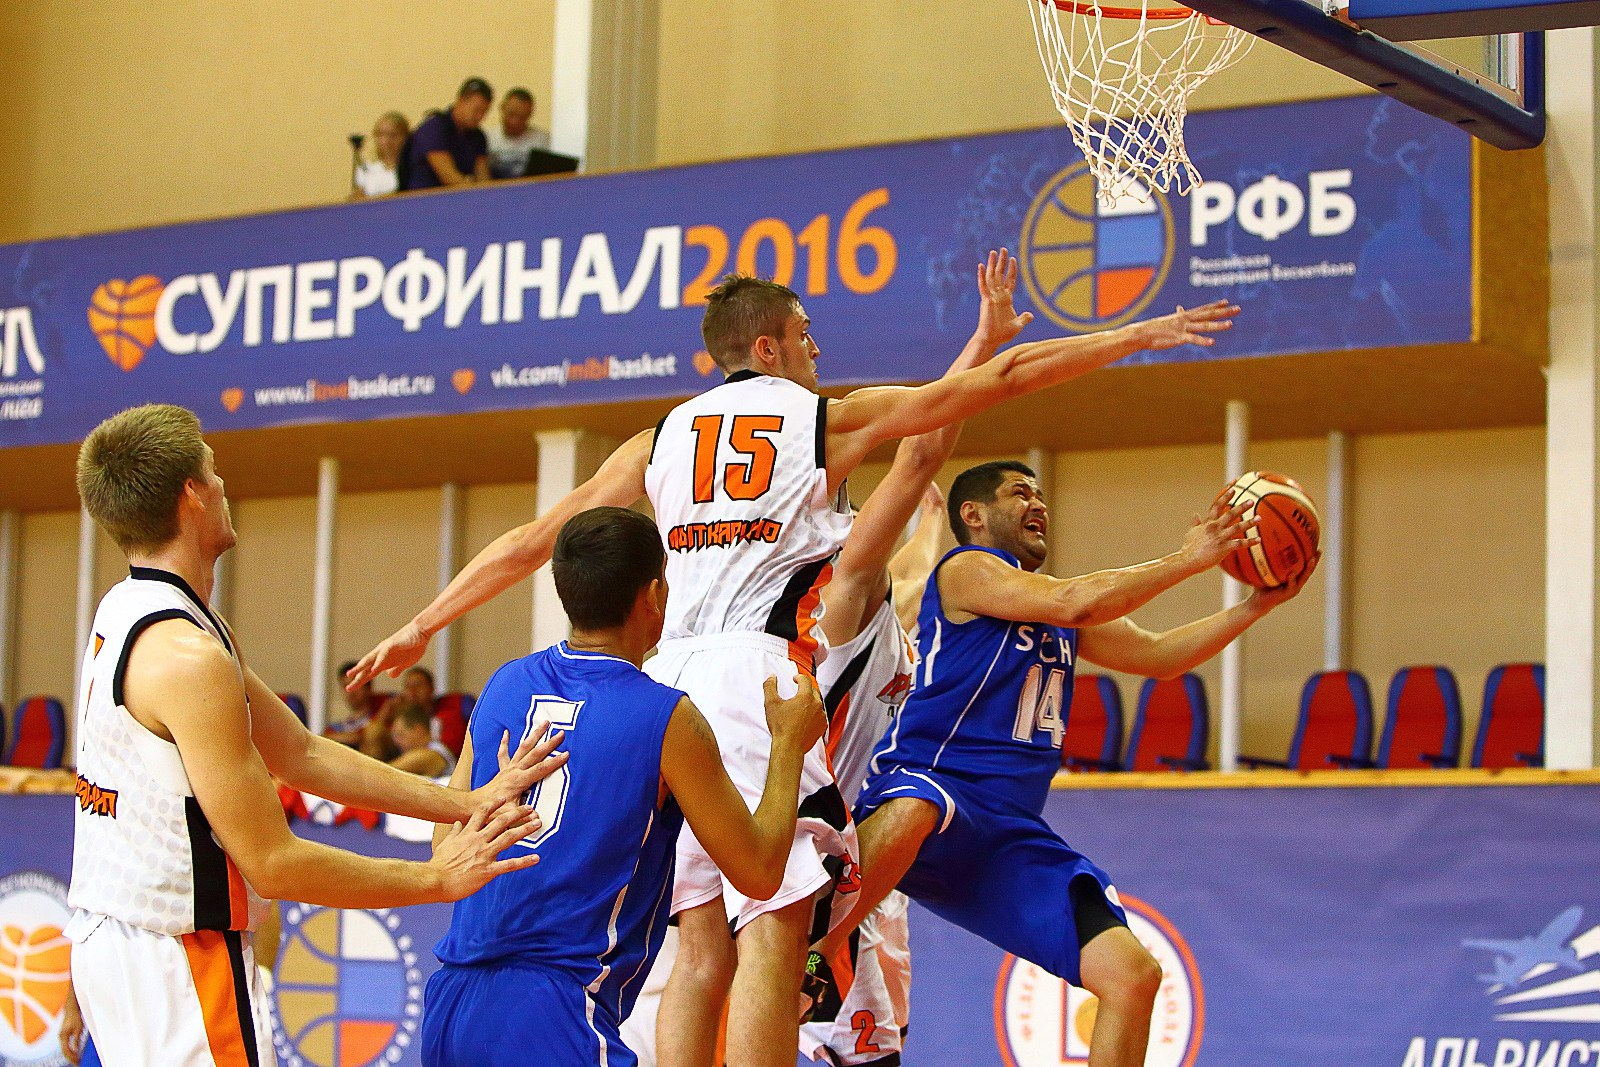 МЛБЛ Суперфинал 2016